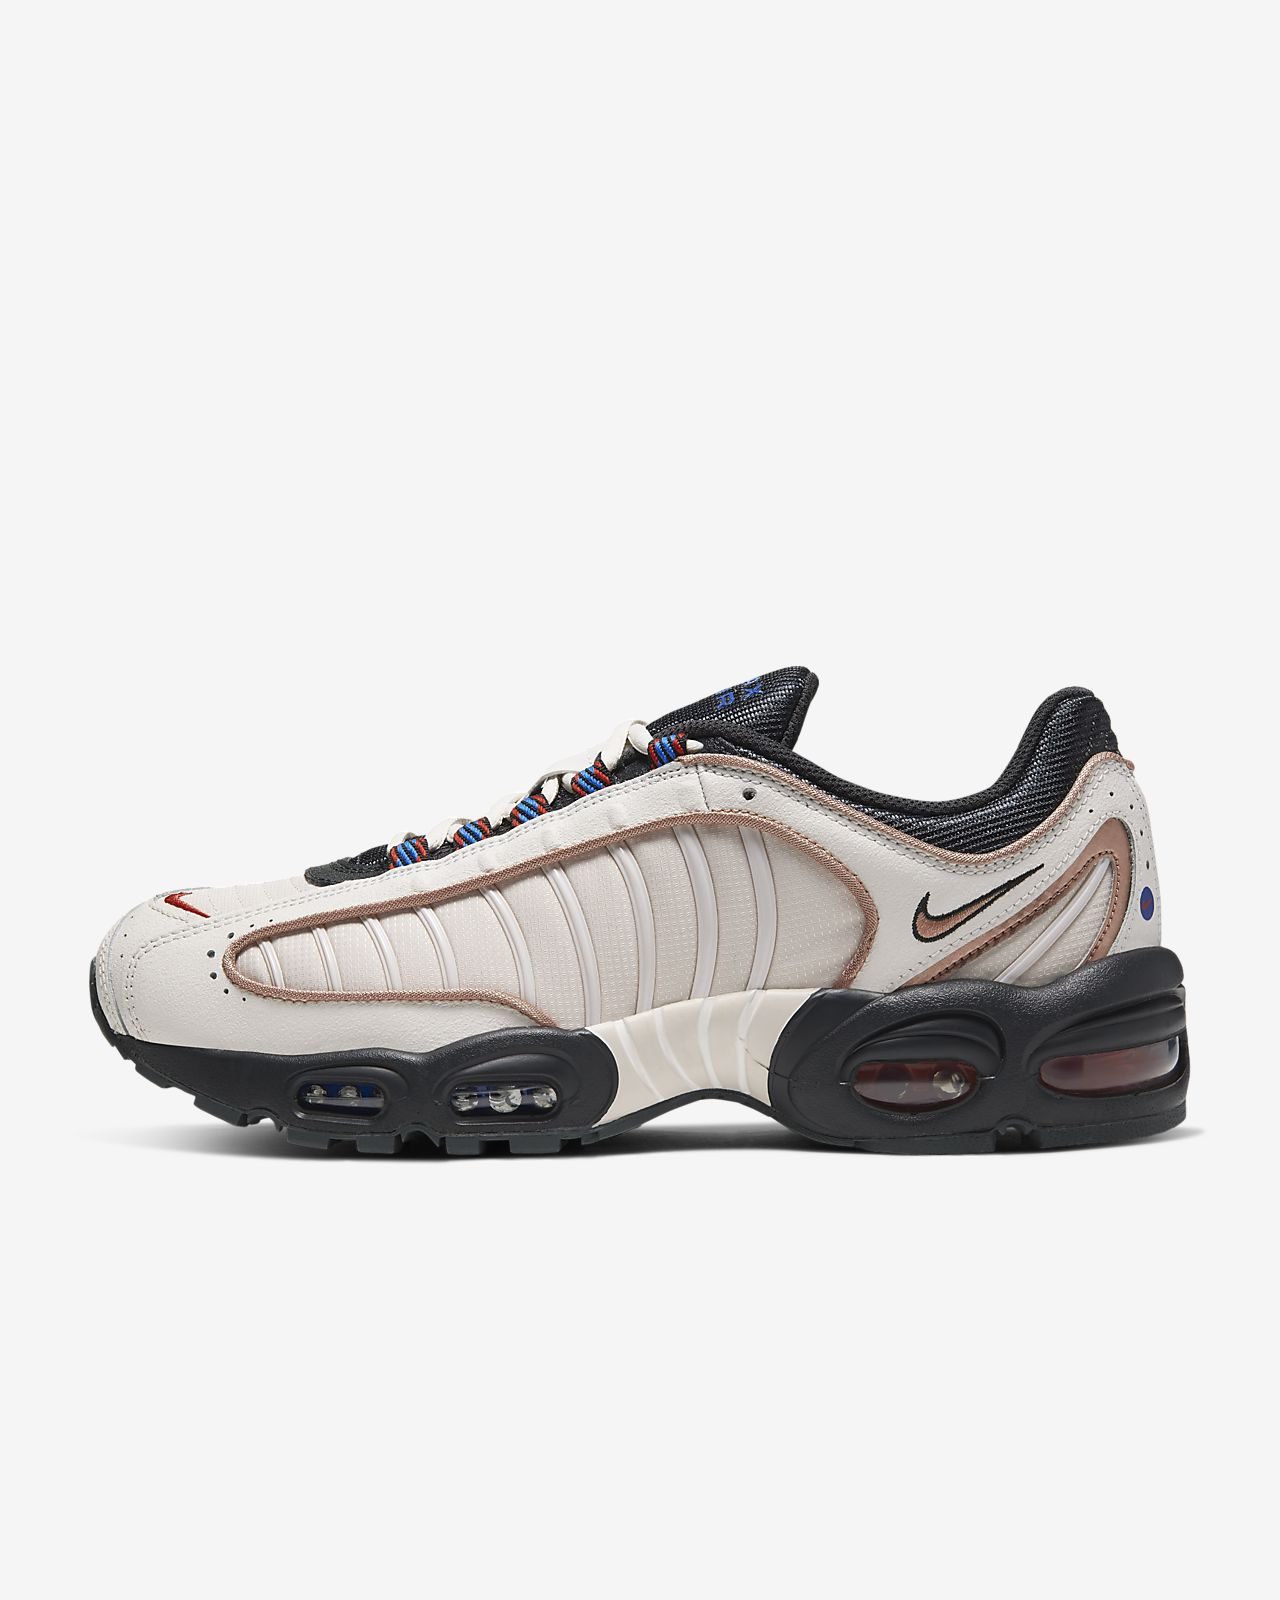 Nike Air Max Tailwind IV SE 男鞋